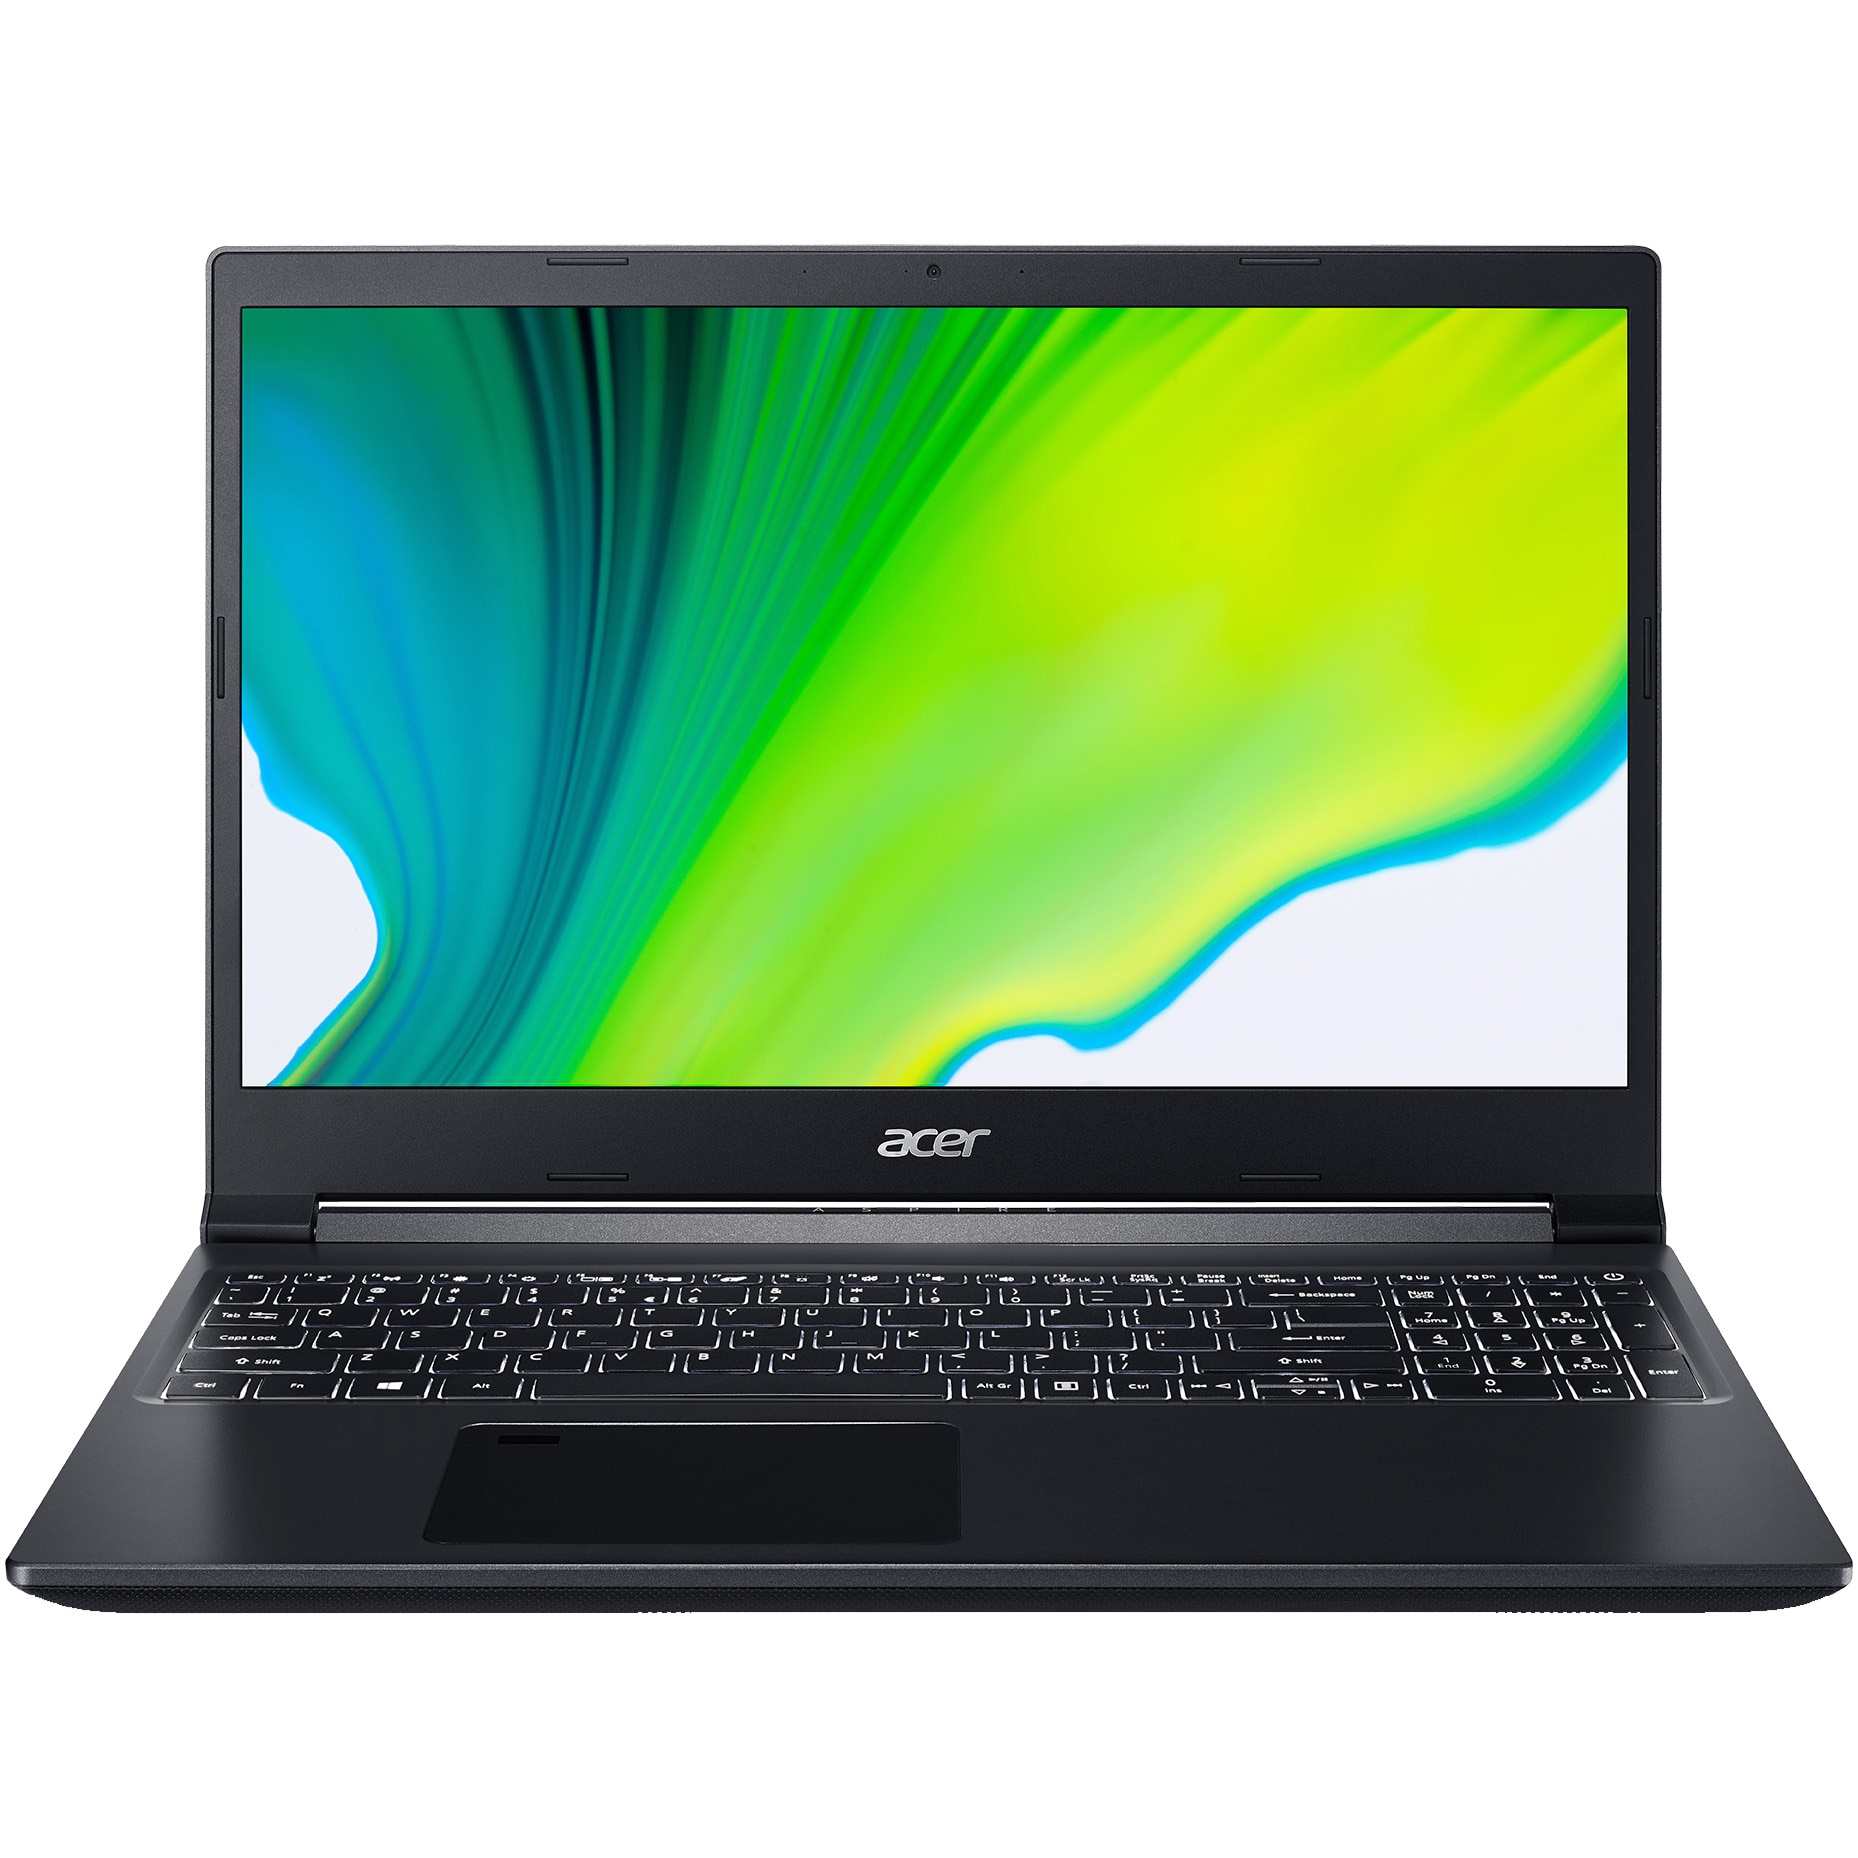 "Fotografie Laptop Gaming Acer Aspire 7 A715-41G cu procesor AMD Ryzen 5 3550H pana la 3.70 GHz, 15.6"", Full HD, IPS, 8GB, 512GB SSD, NVIDIA GeForce GTX 1650 4GB, No OS, Black"